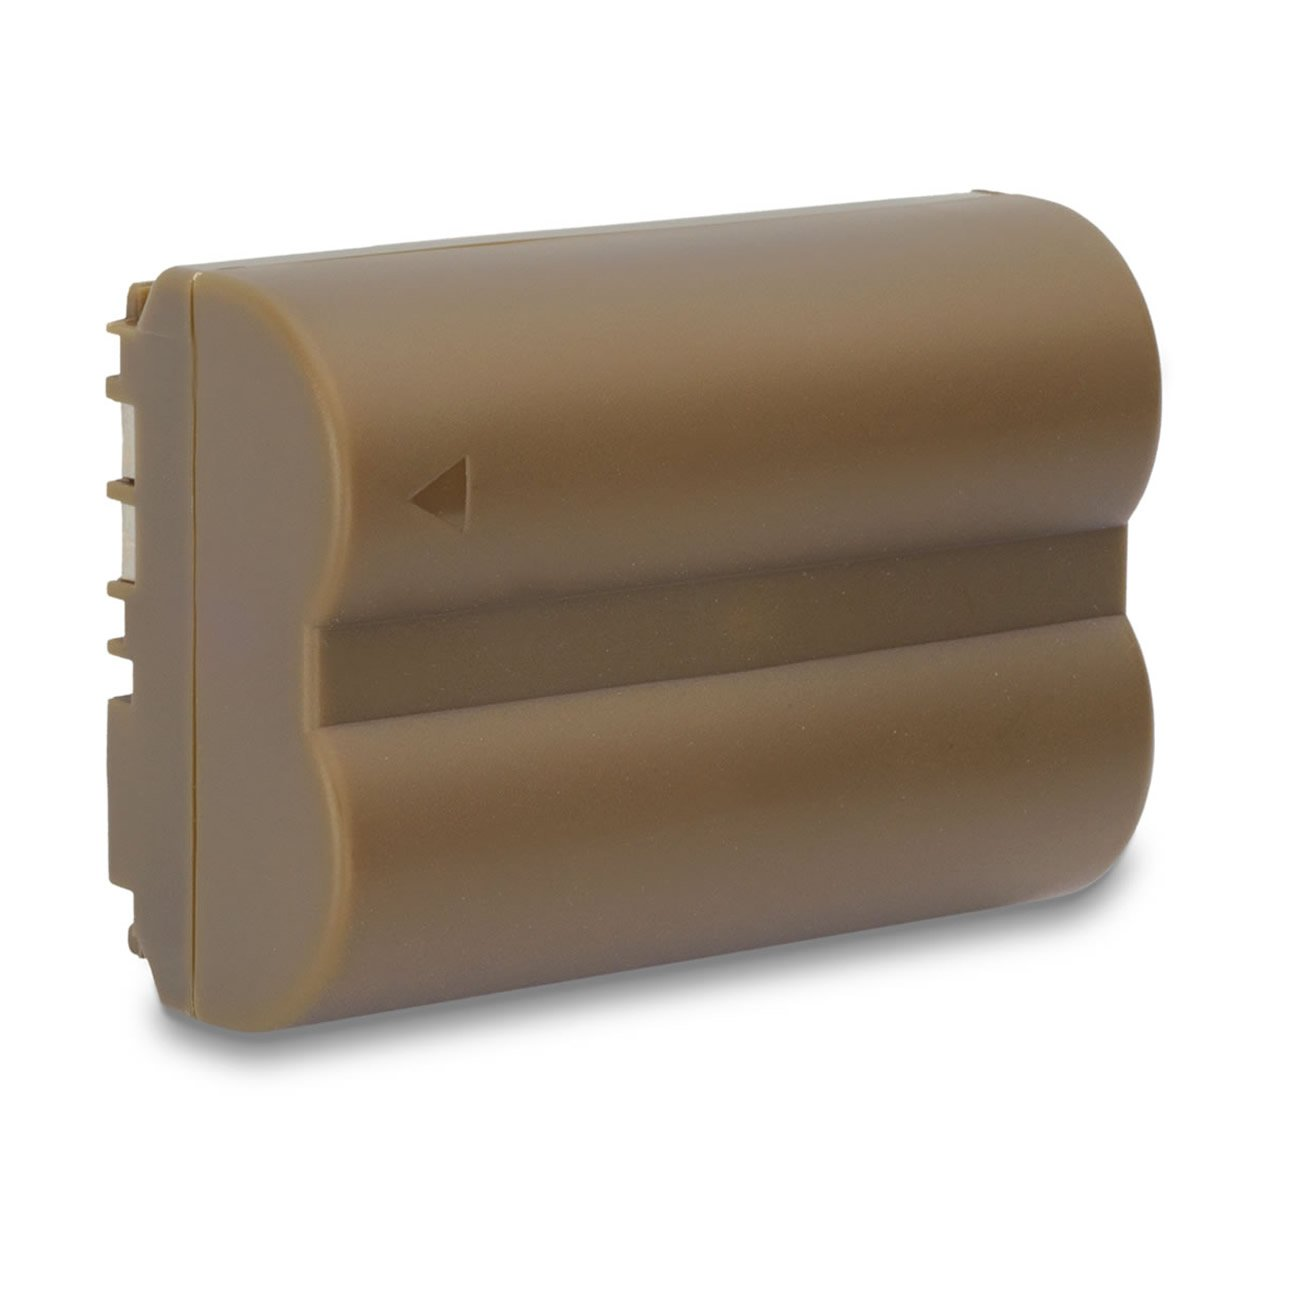 MV-300 CMV500 G5 EOS 300D MV-30 MV600 MV-400 2x Bateria BP-508 BP-512 para Canon PowerShot G1 Pro 90 IS G2 PATONA 2in1 Dual Cargador con micro USB MV-450 Pro1 G3 EOS 10D